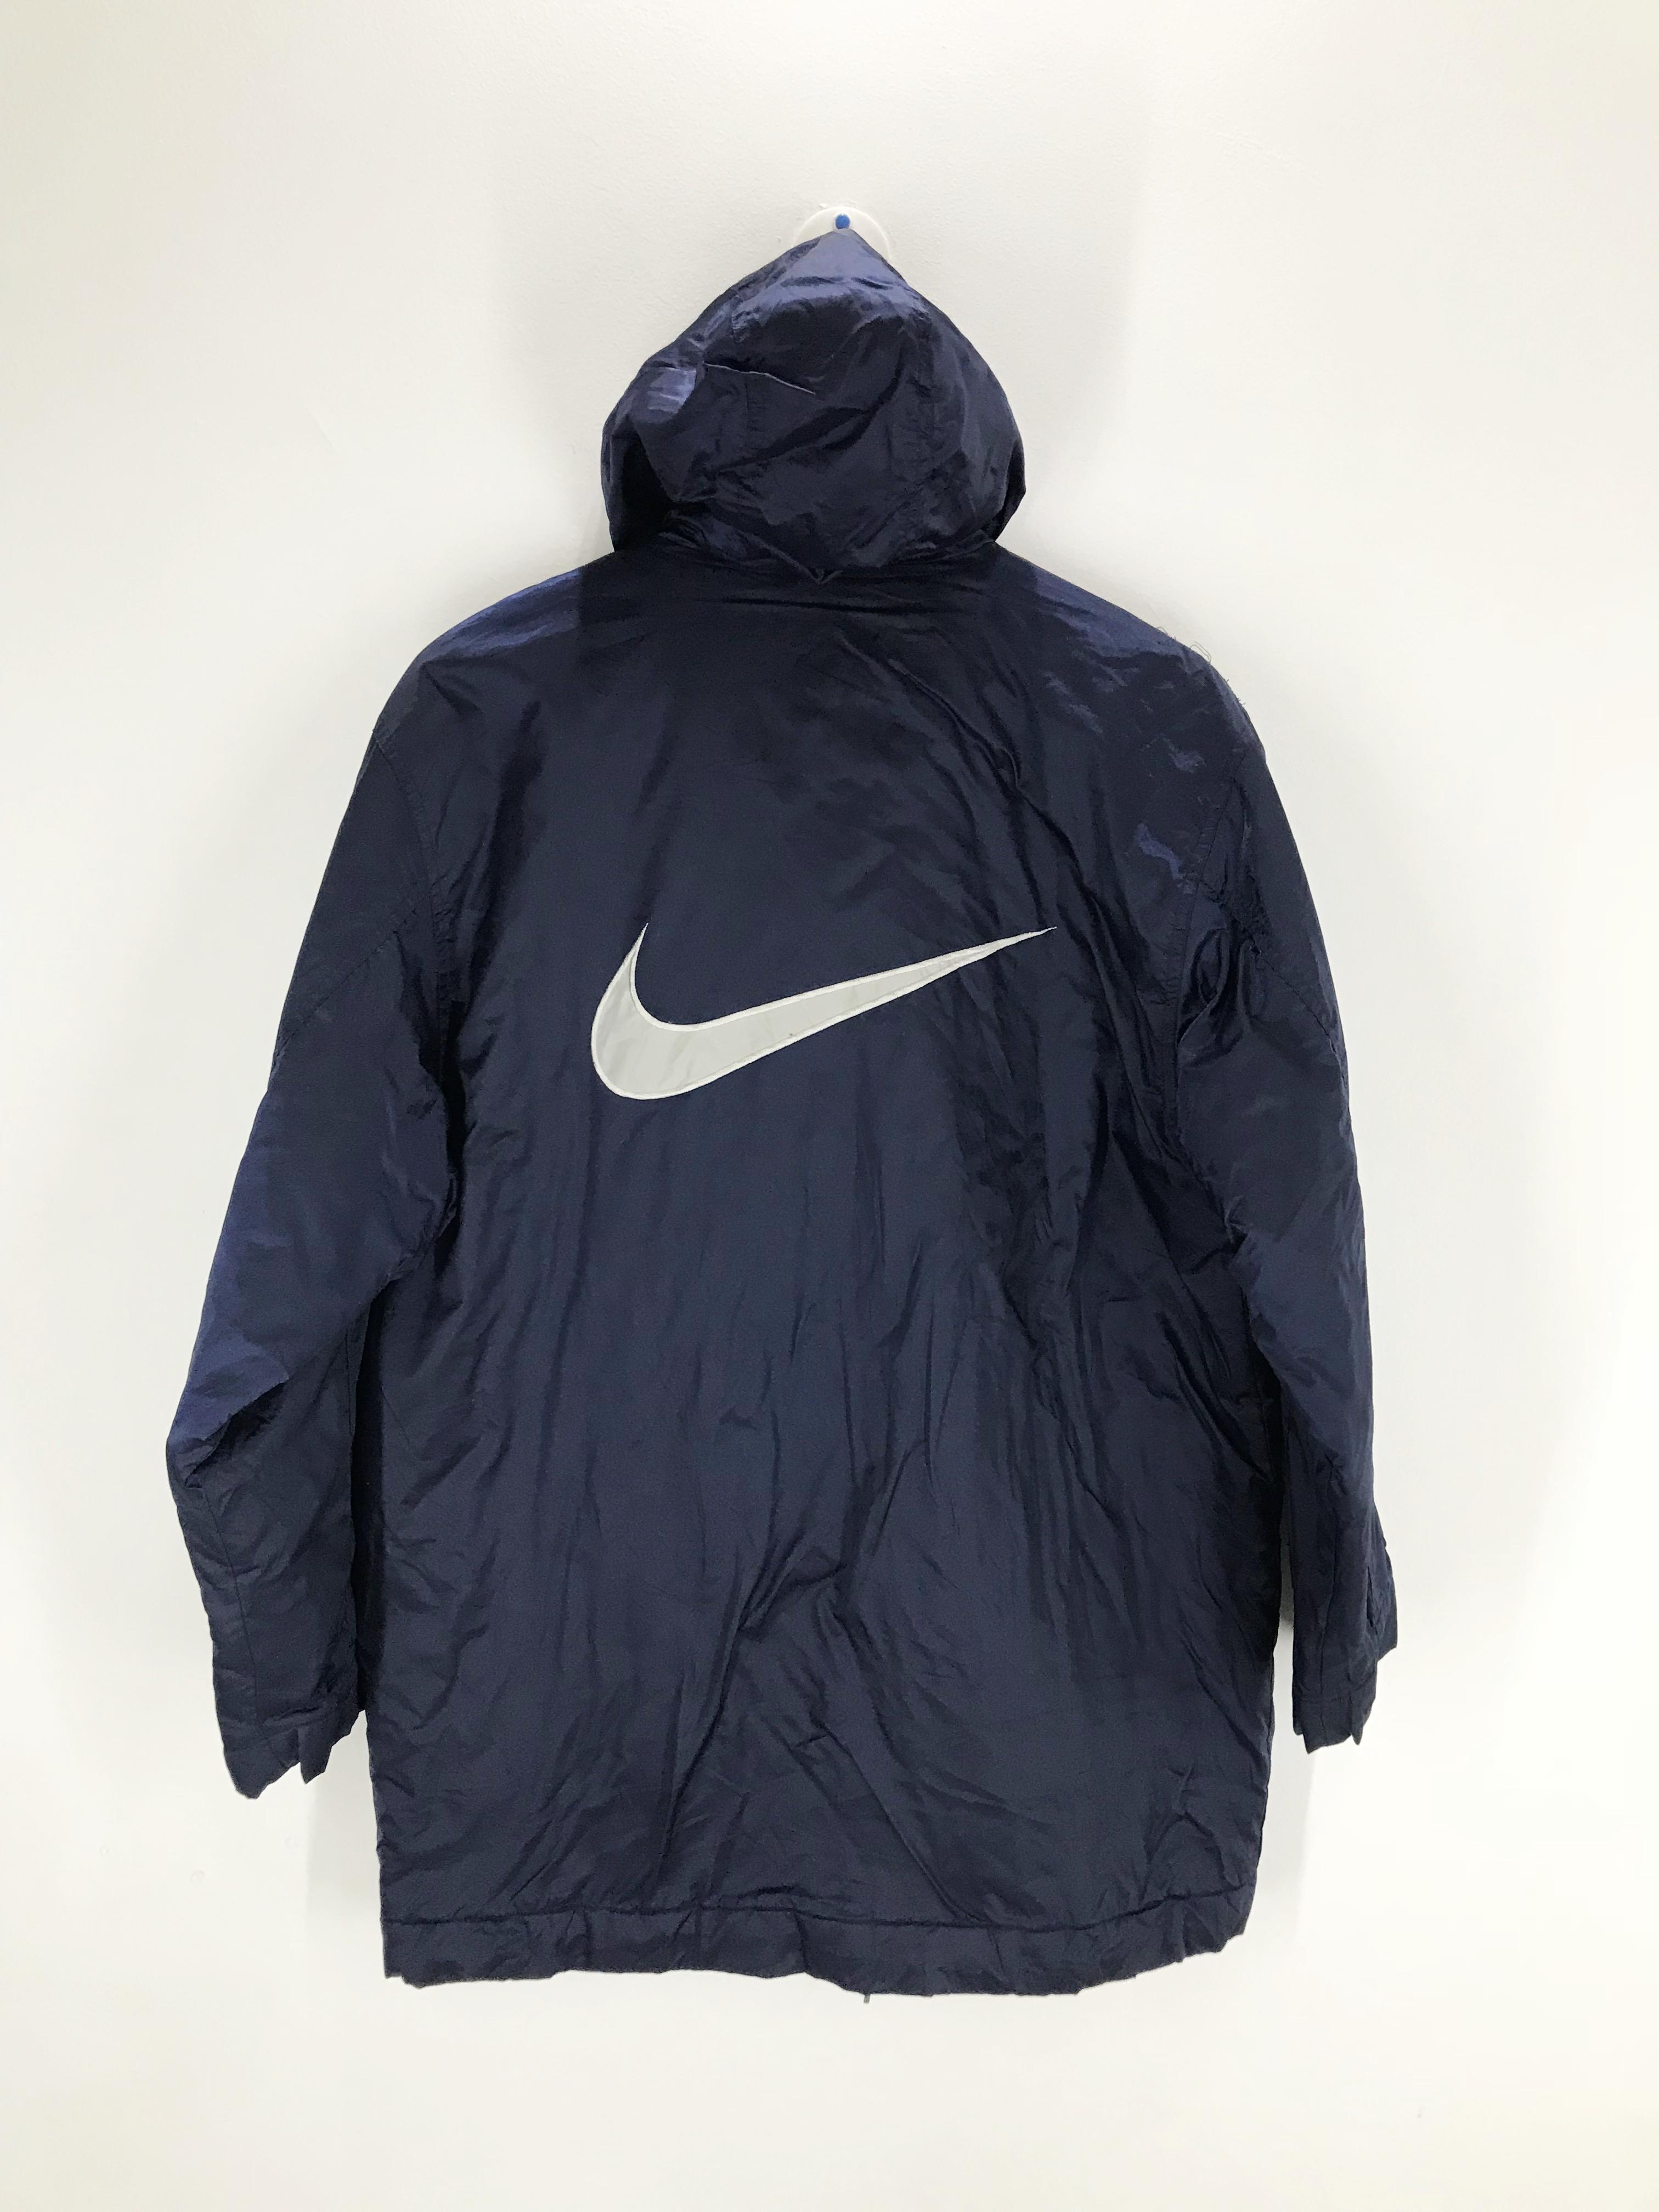 1a55fca6a6 Nike Vintage Nike Swoosh Drawstring Hoodie Long Jacket | Grailed